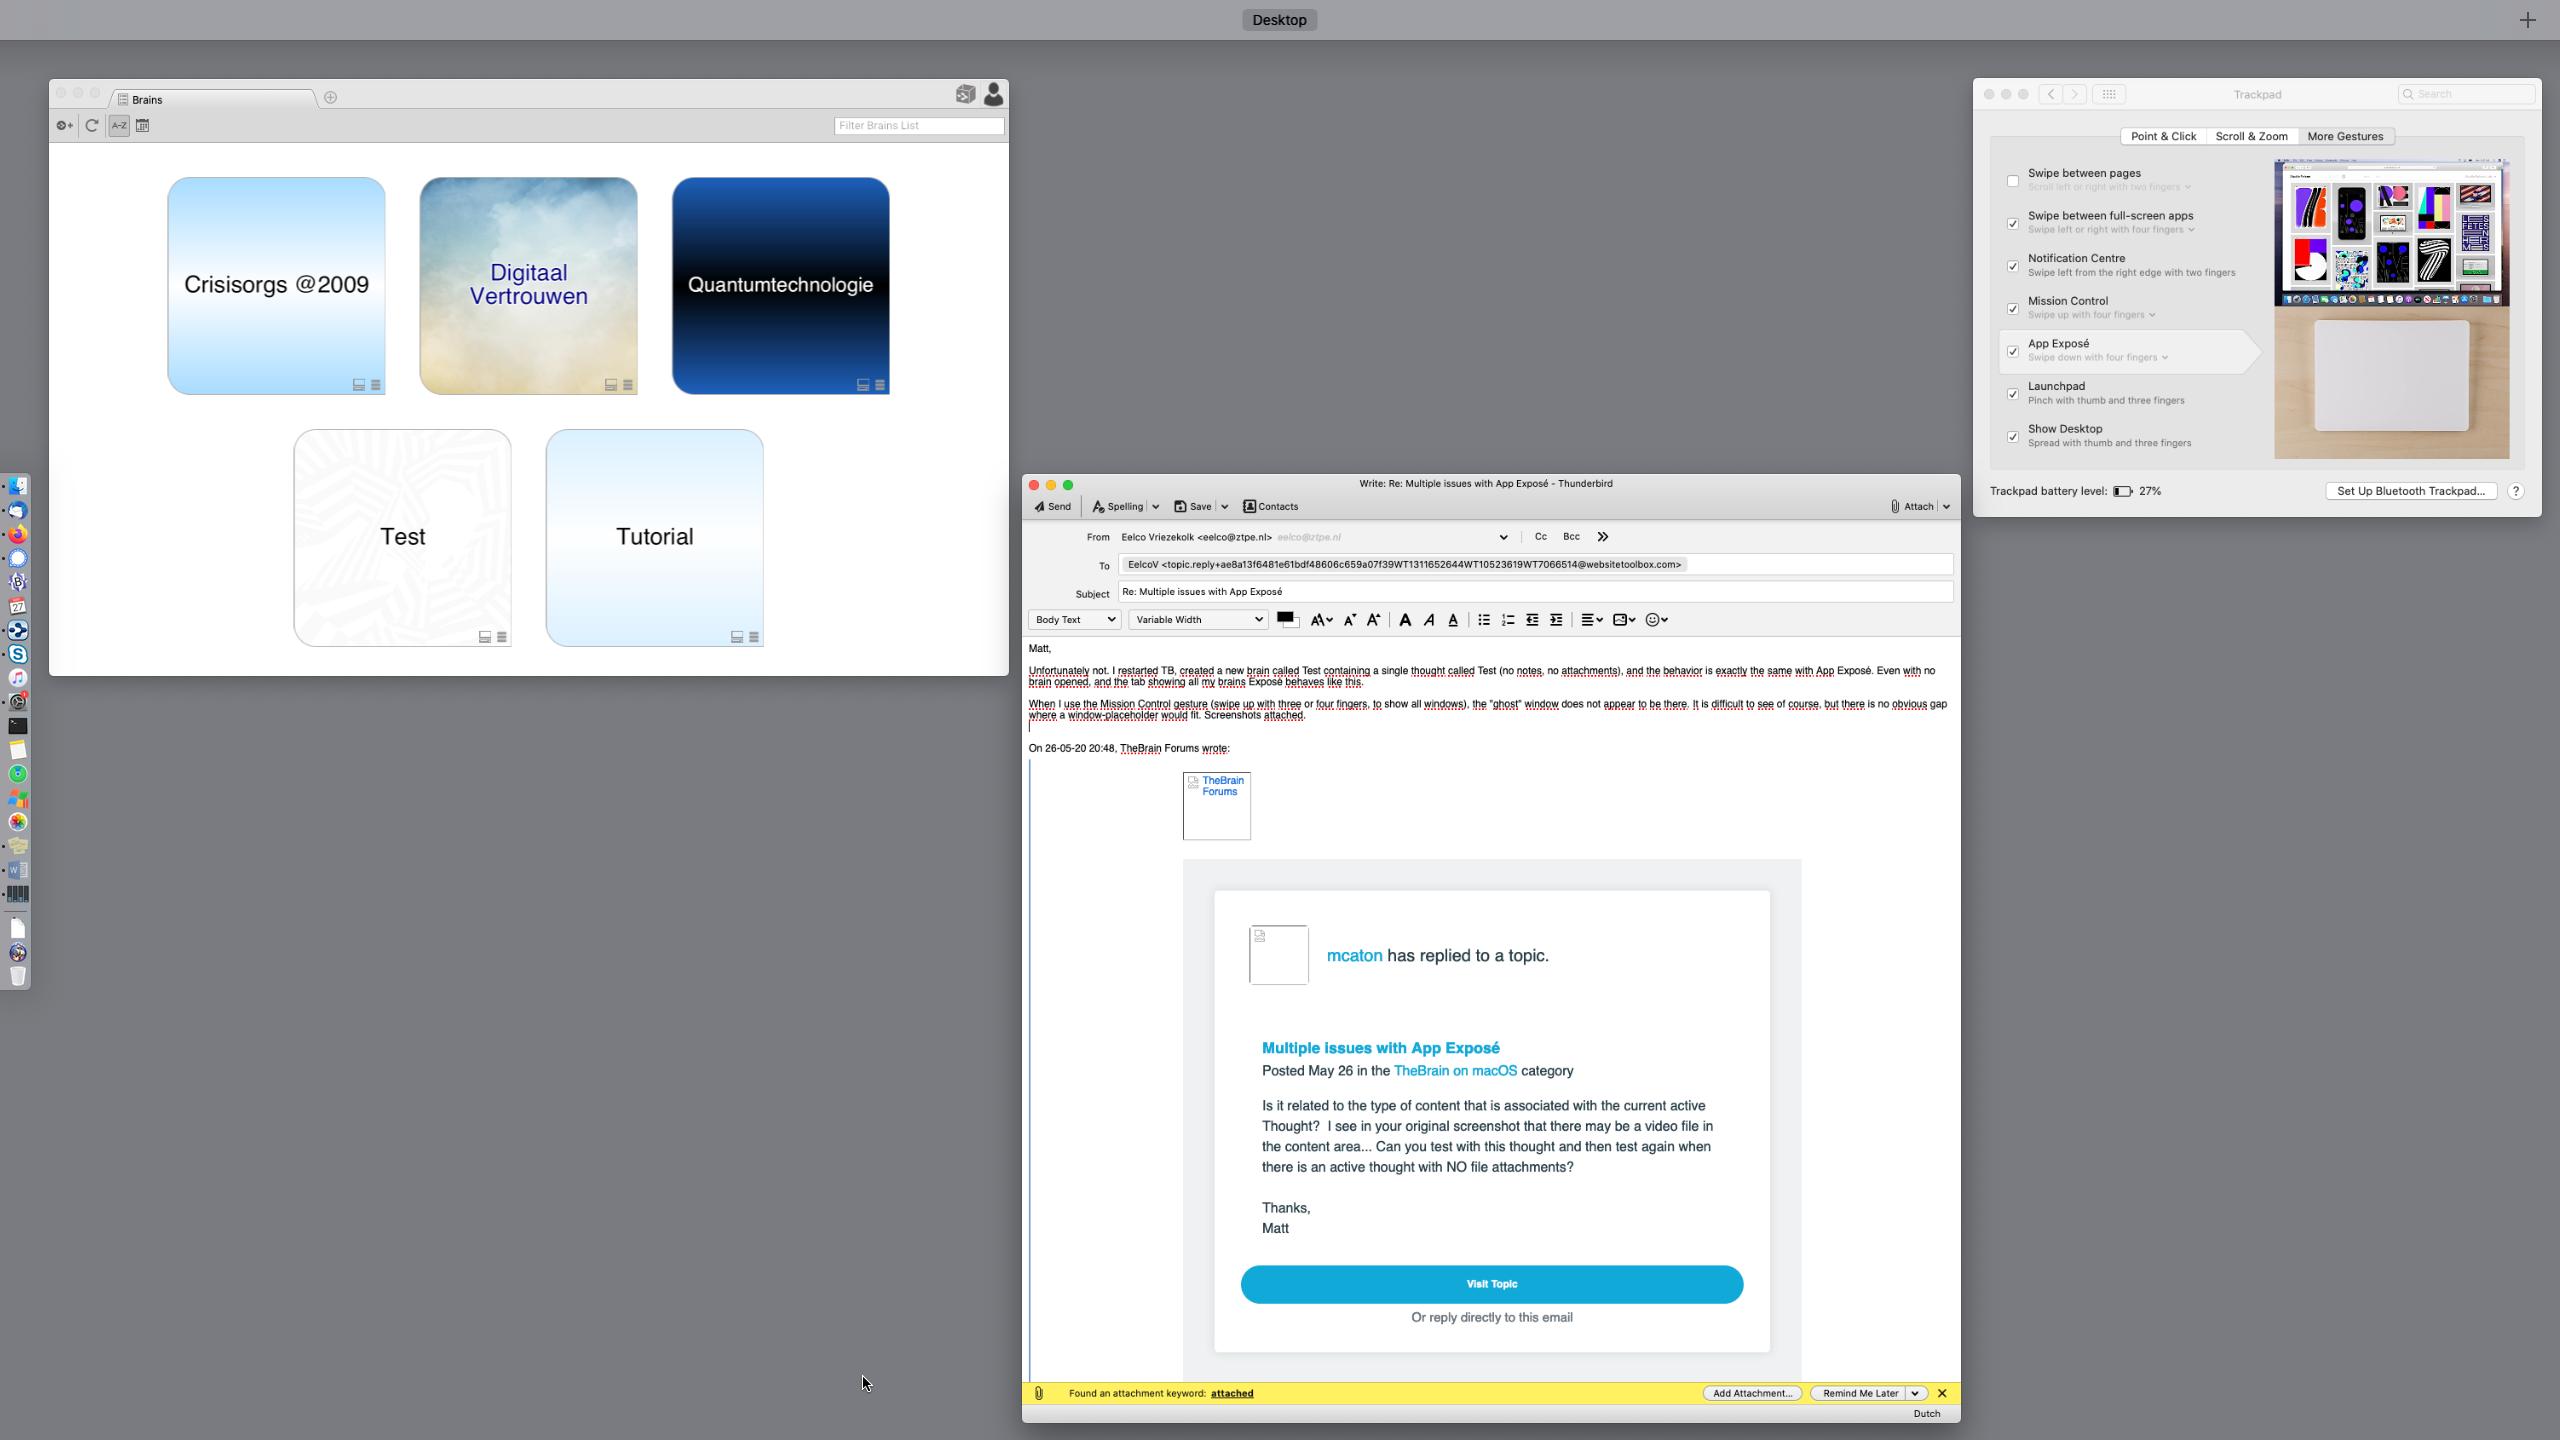 Click image for larger version - Name: Screenshot 2020-05-27 at 07.54.34.png, Views: 12, Size: 758.02 KB